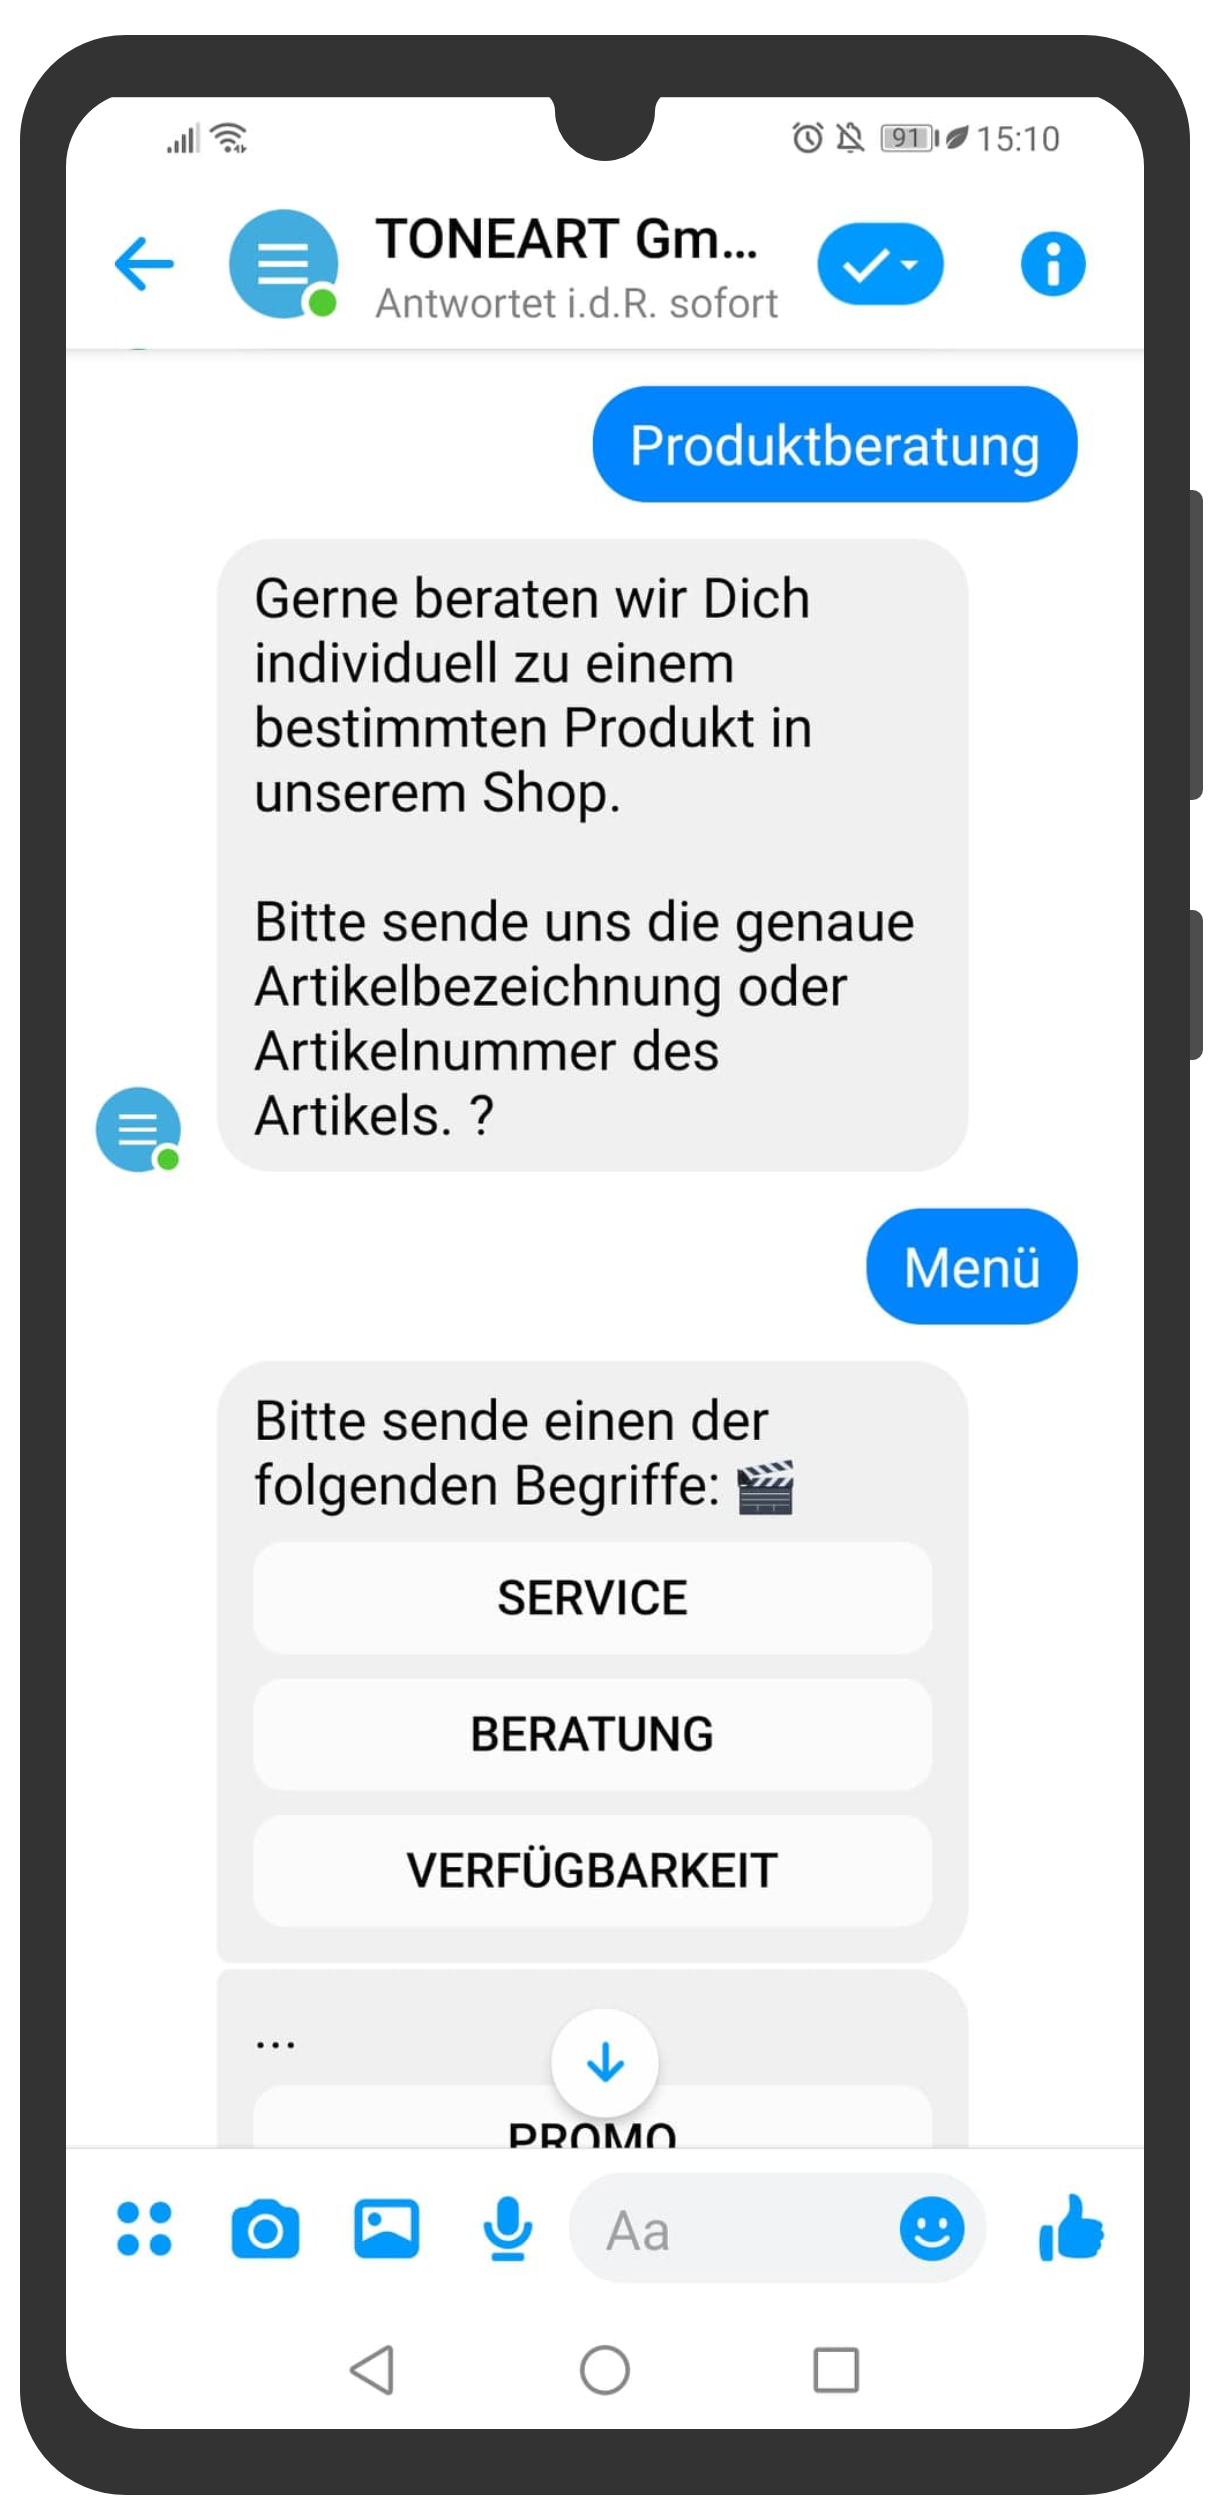 Toneart gmbh chatbot